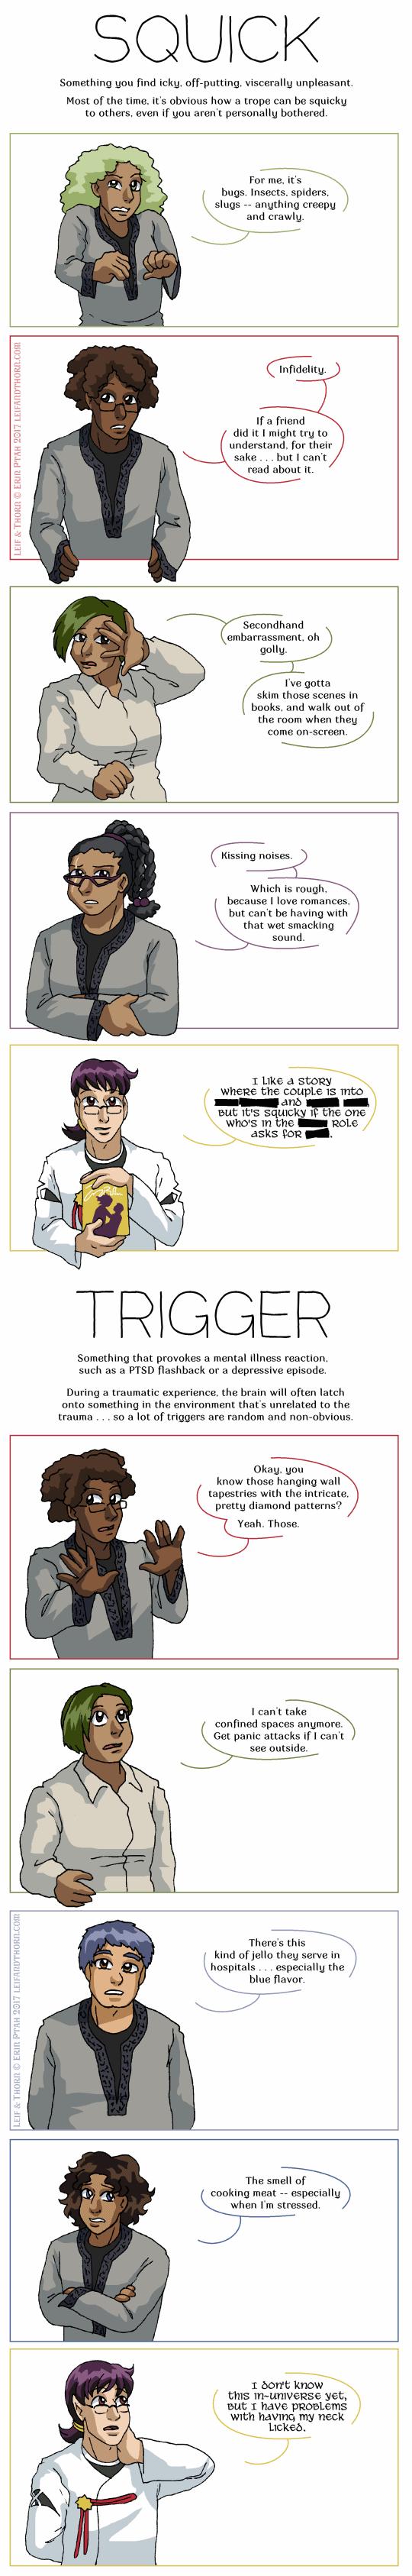 Squicks vs. Triggers